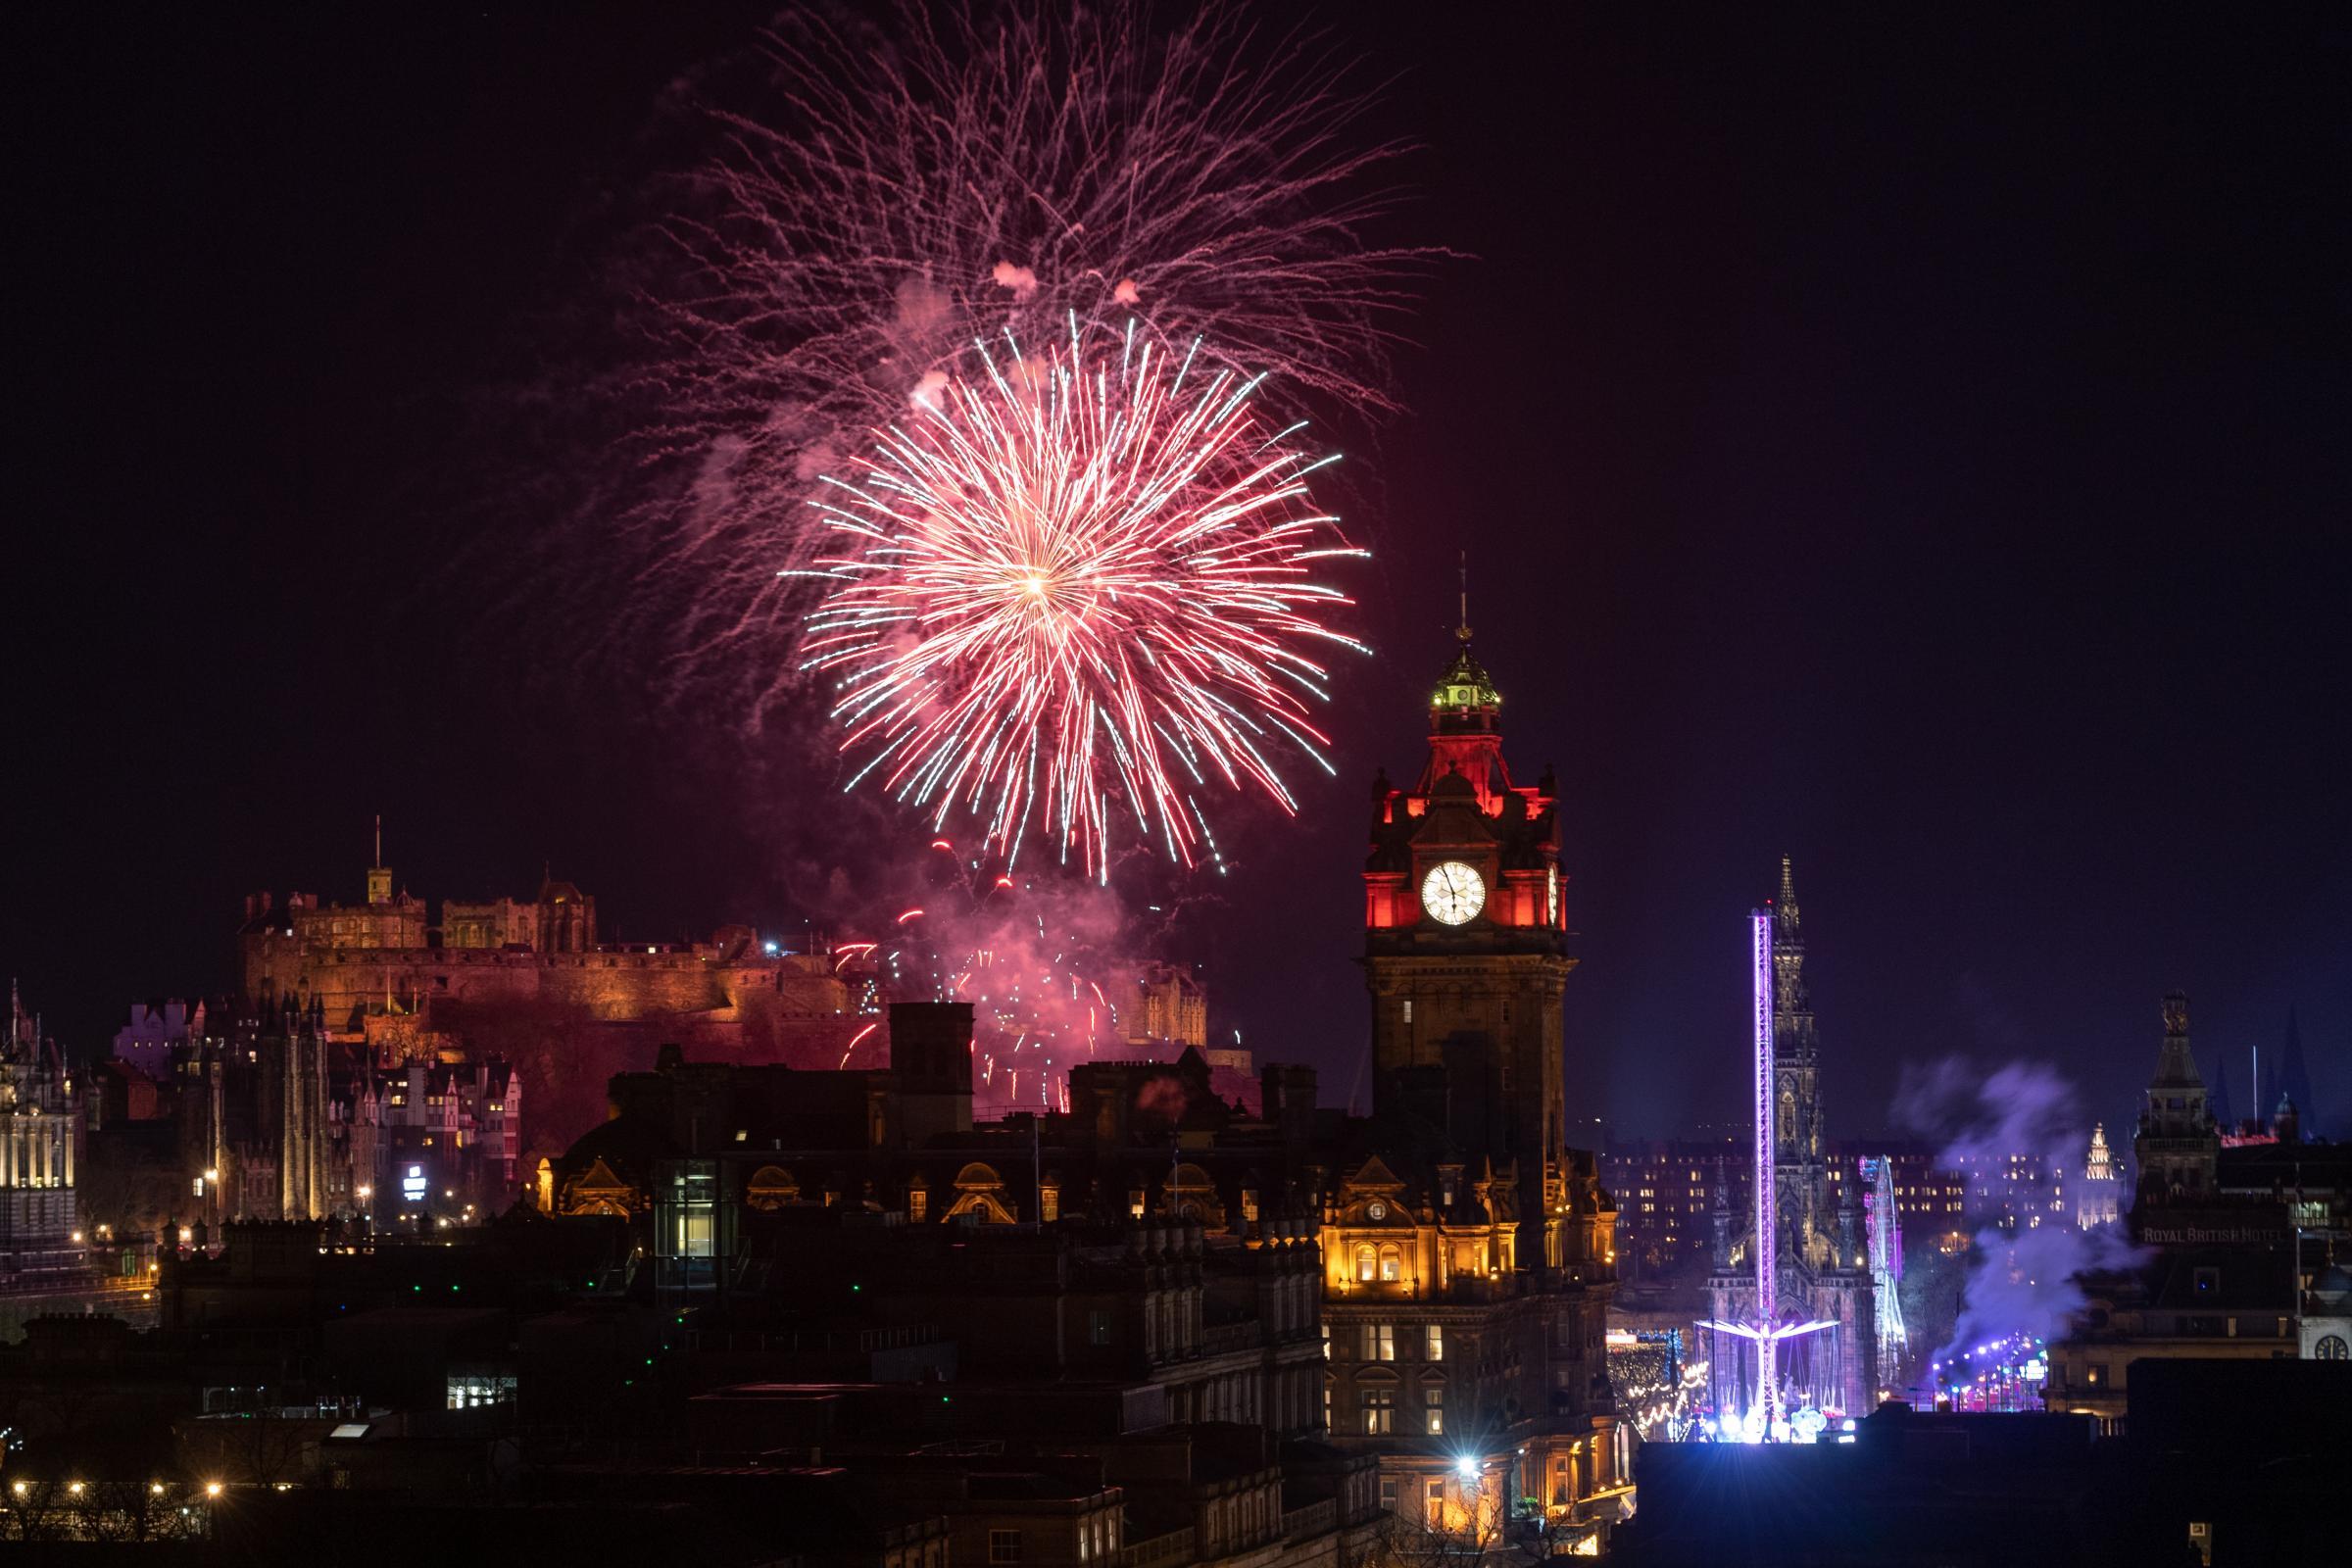 Edinburgh Hogmanay 2021: Ini semua yang perlu Anda ketahui dan cara mendapatkan tiket